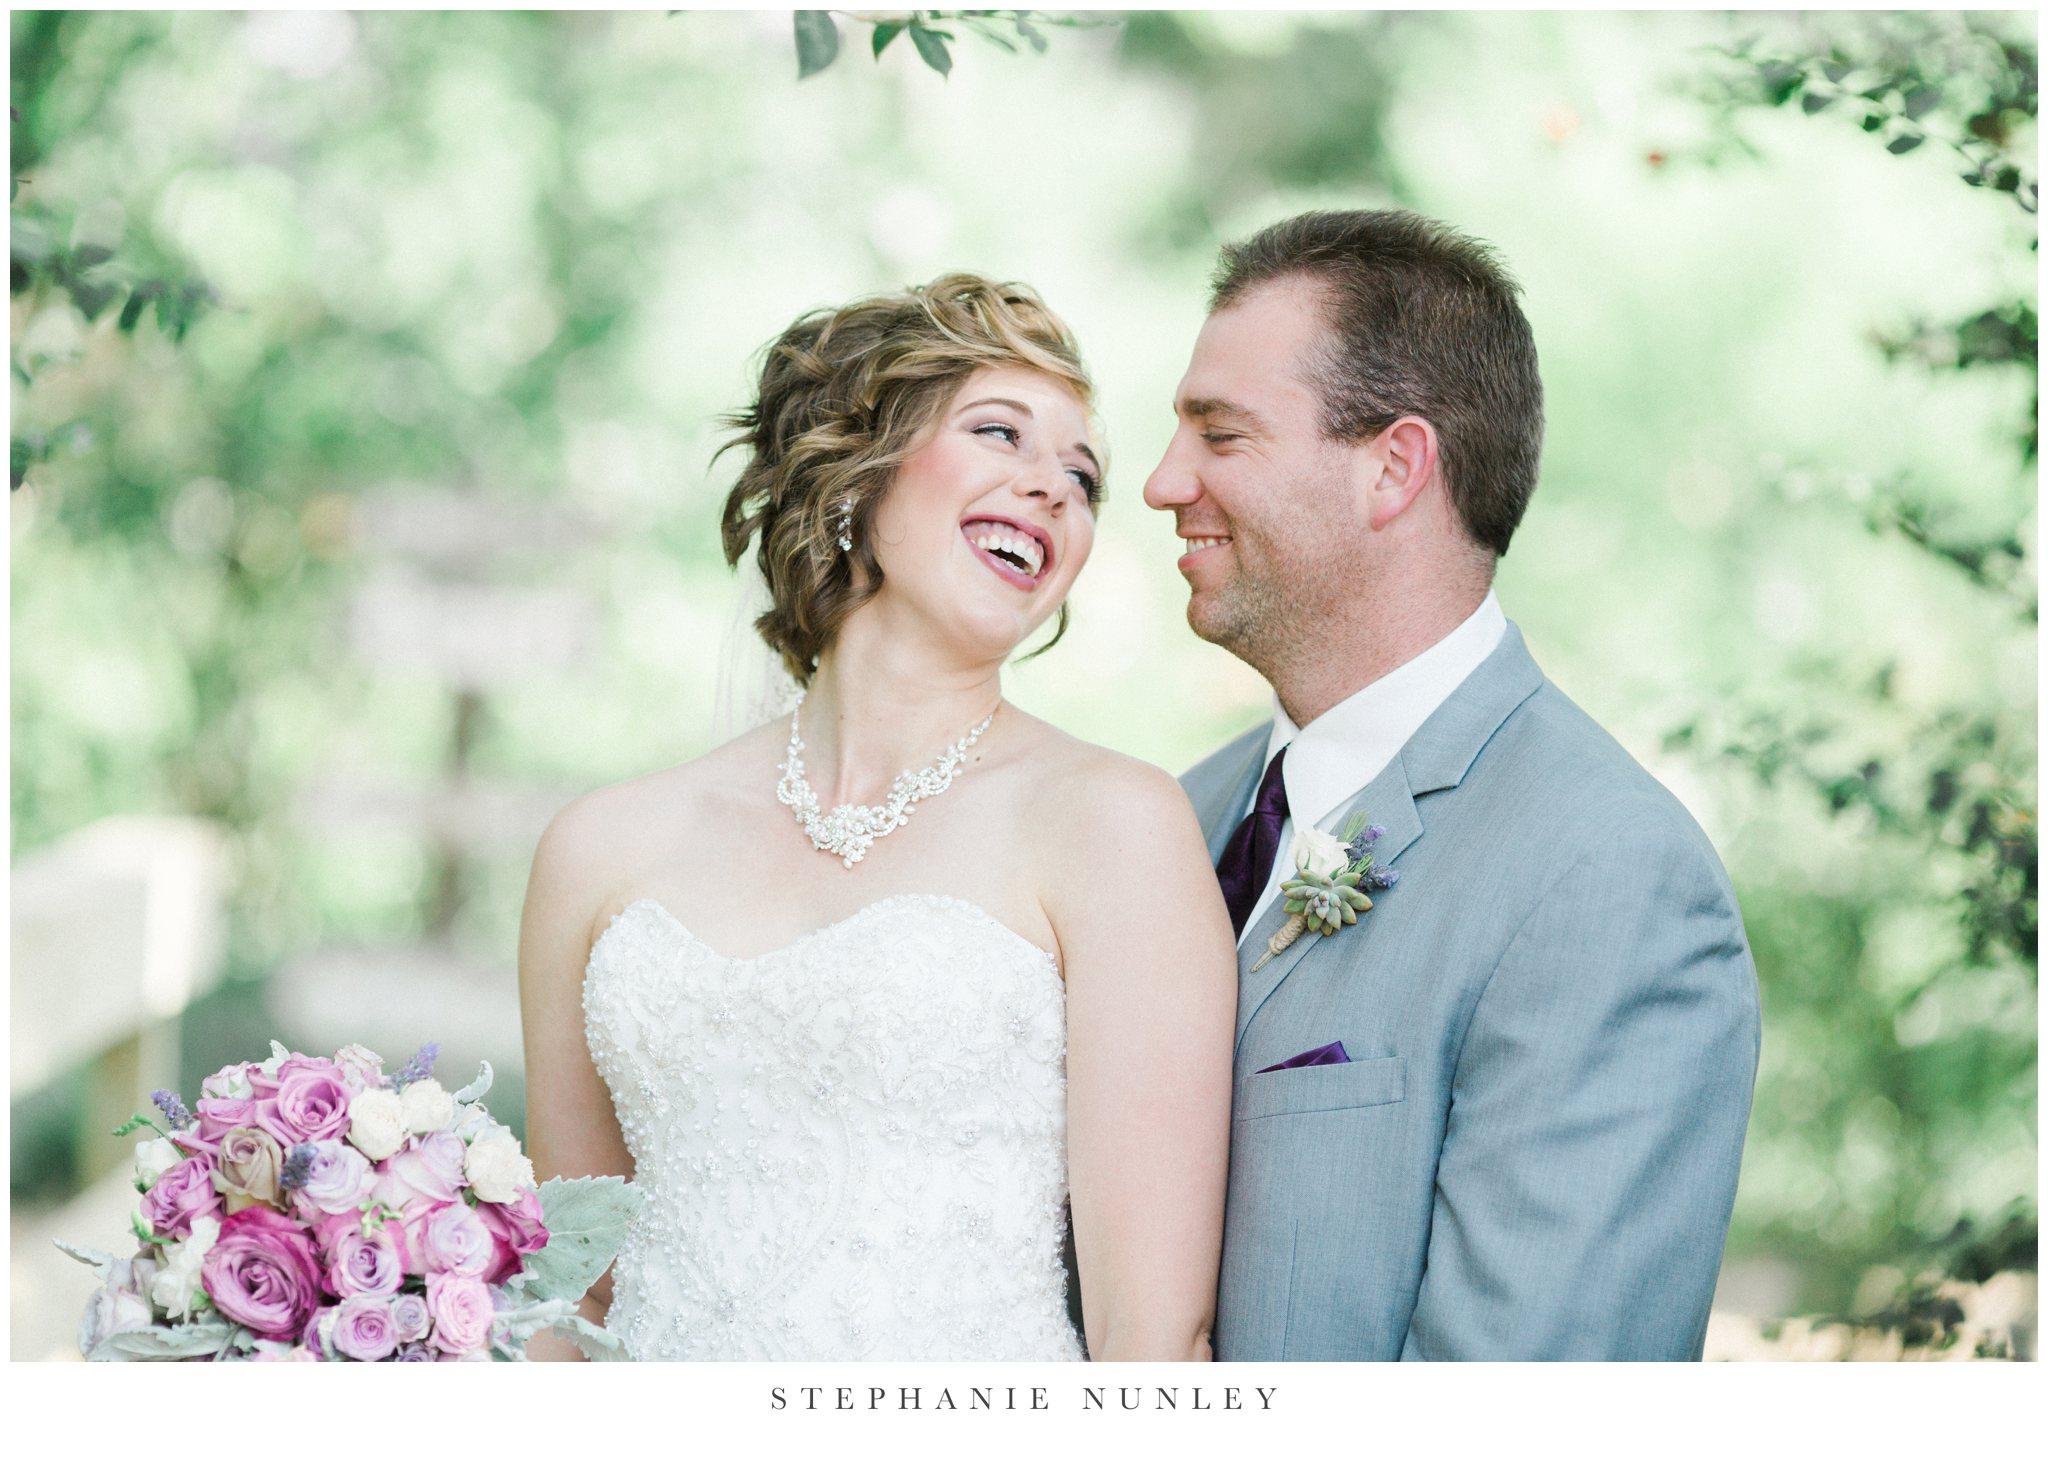 southern-classy-outdoor-barn-wedding-photos-0043.jpg